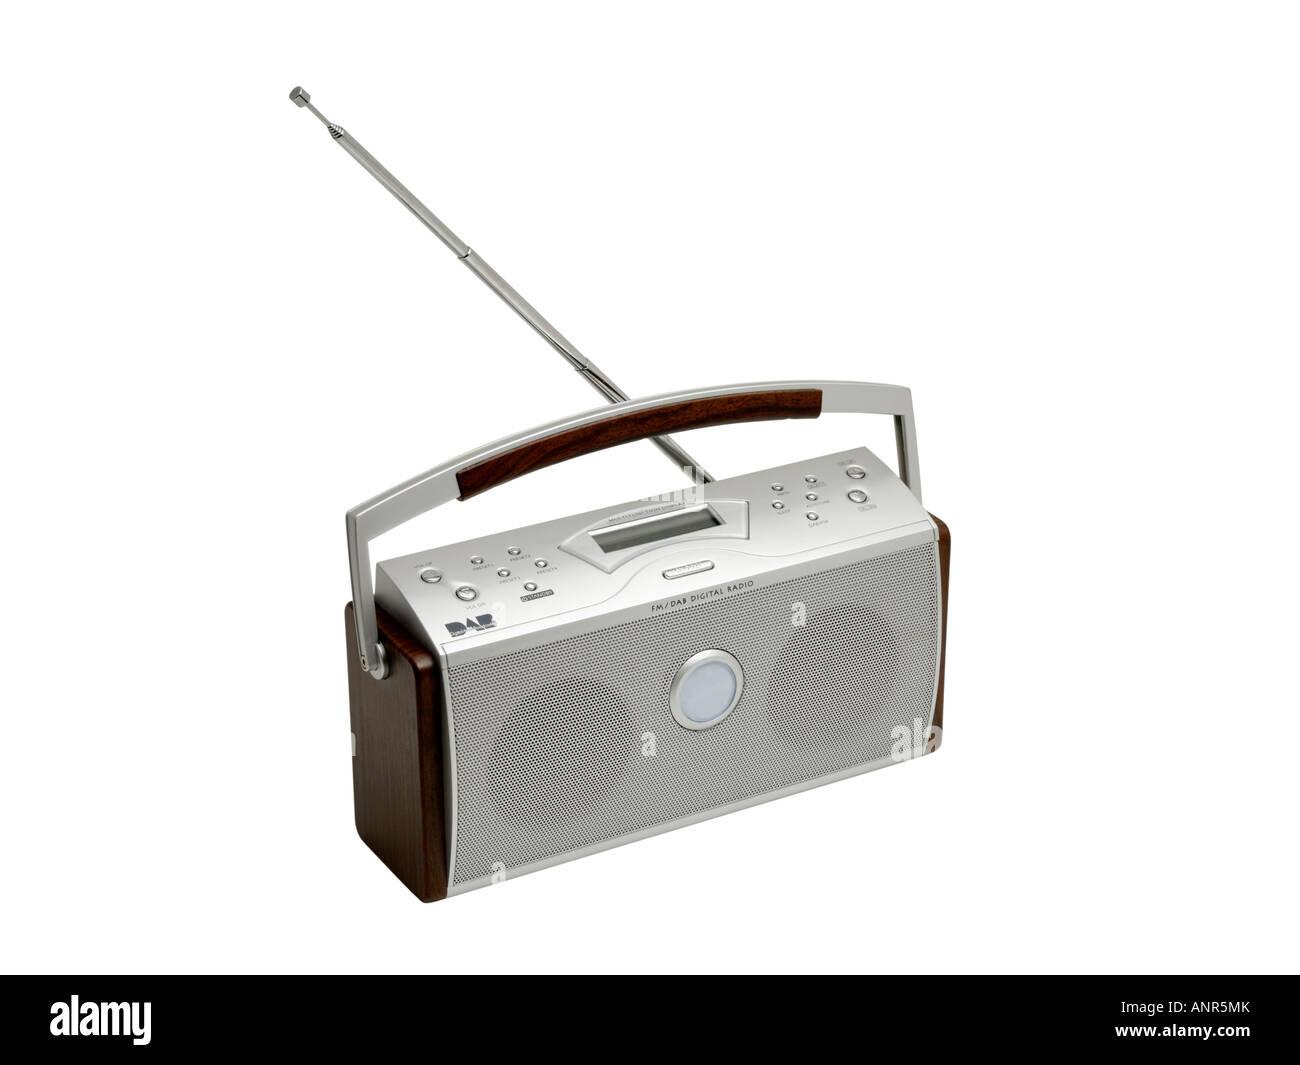 Digital radio DAB - Stock Image